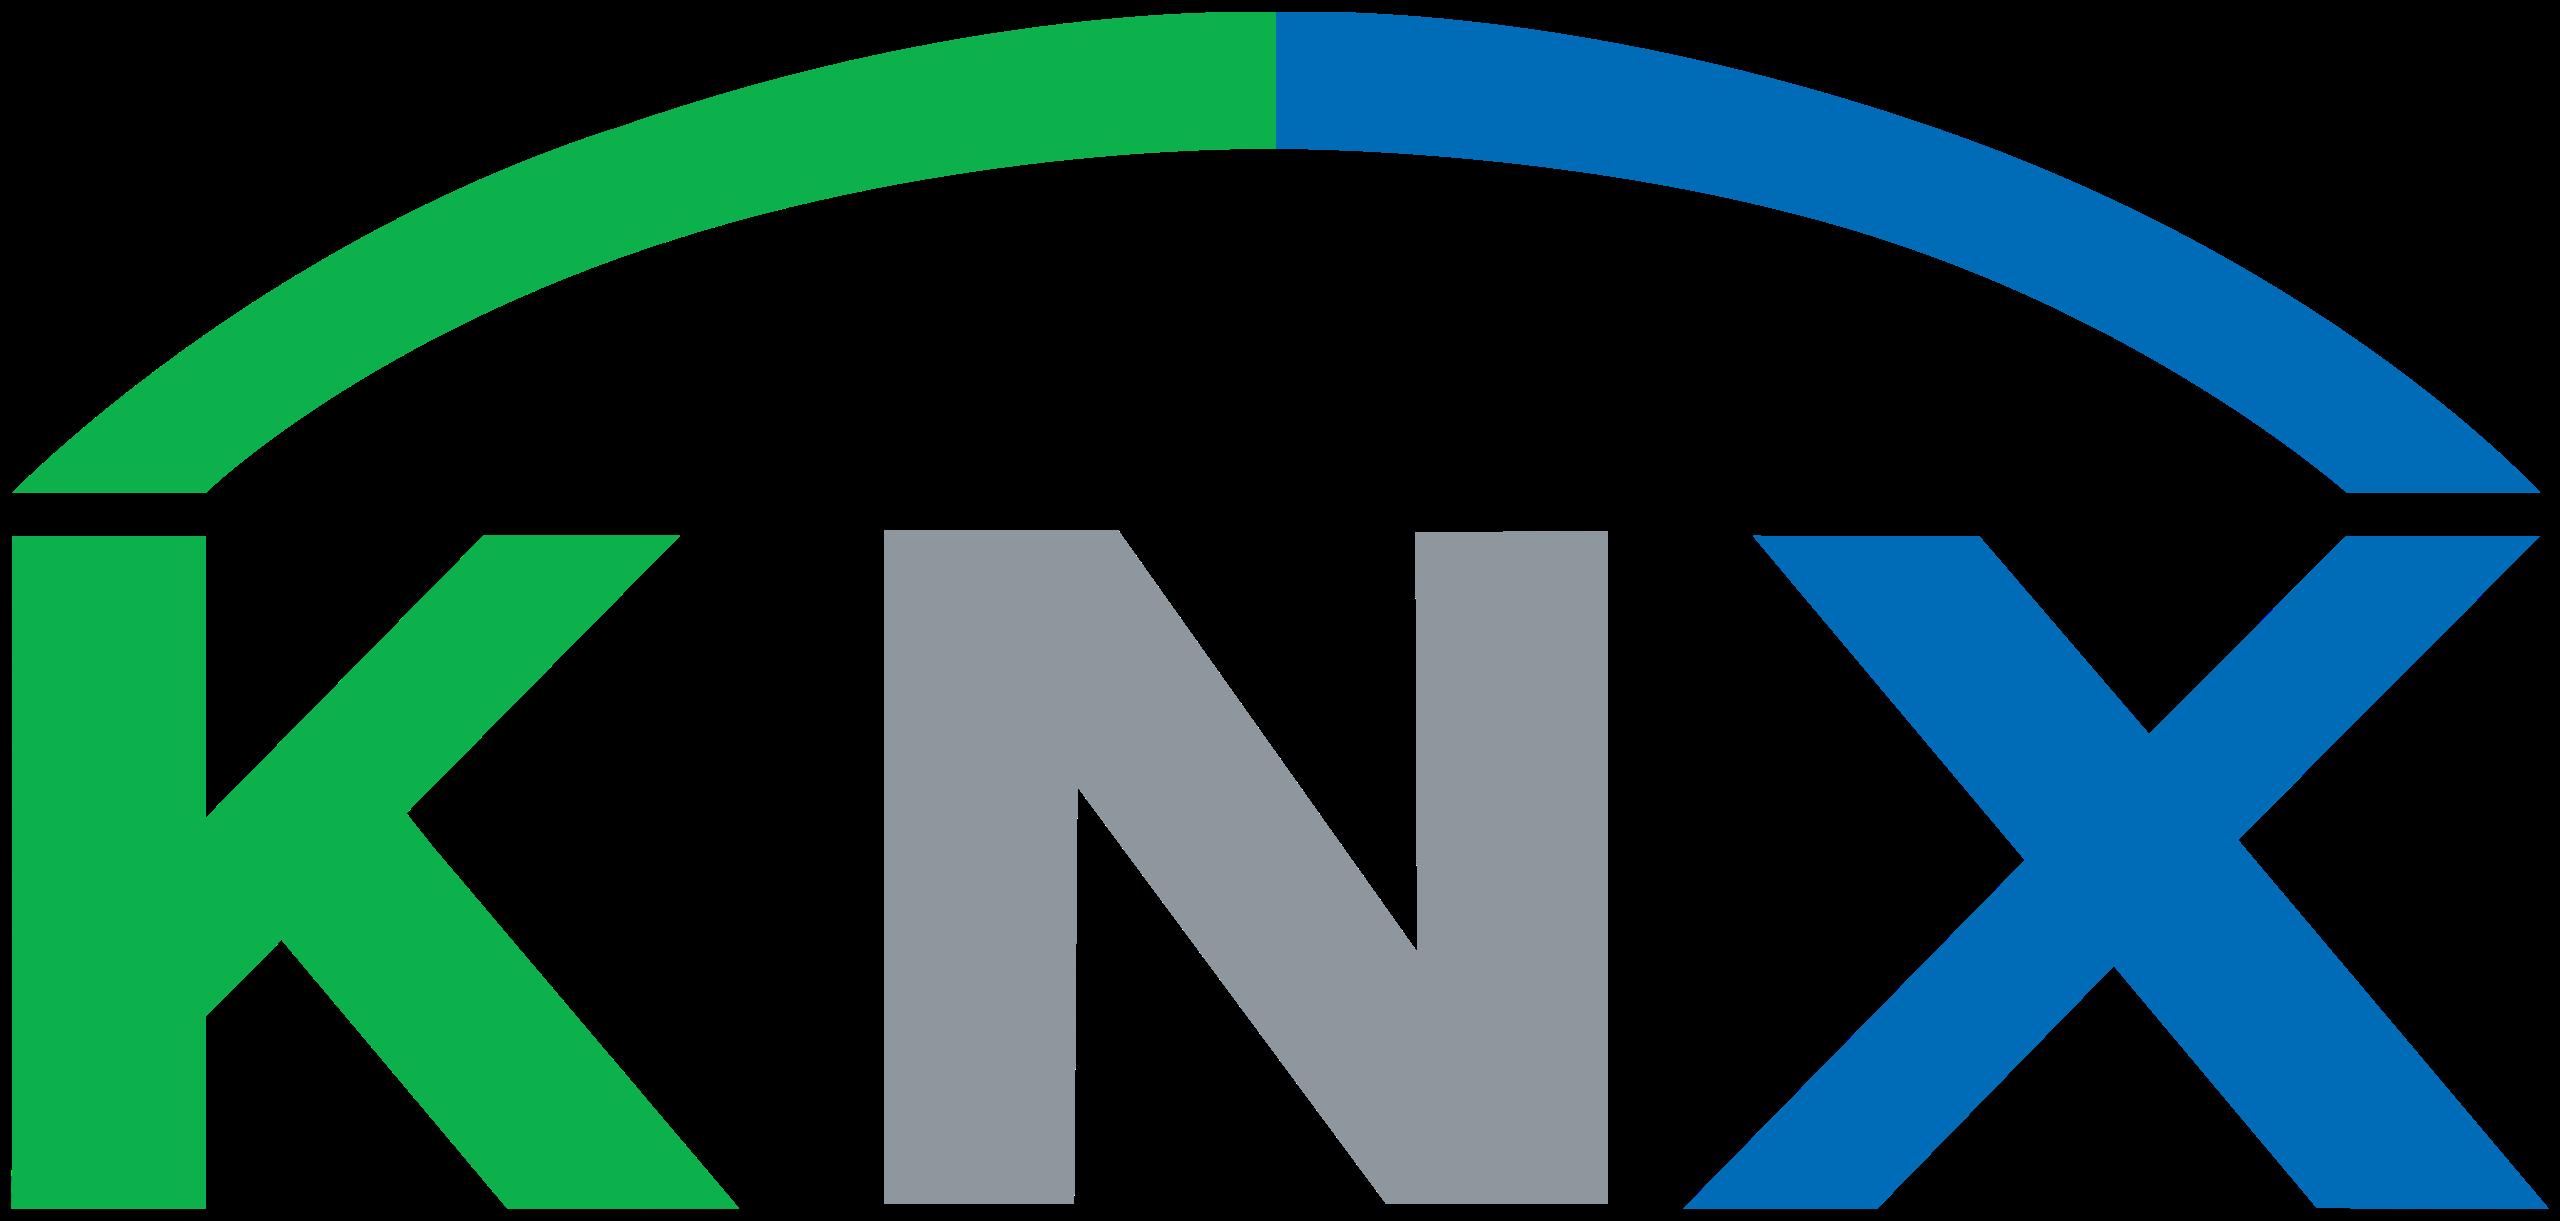 2560px-KNX_logo_svg.png